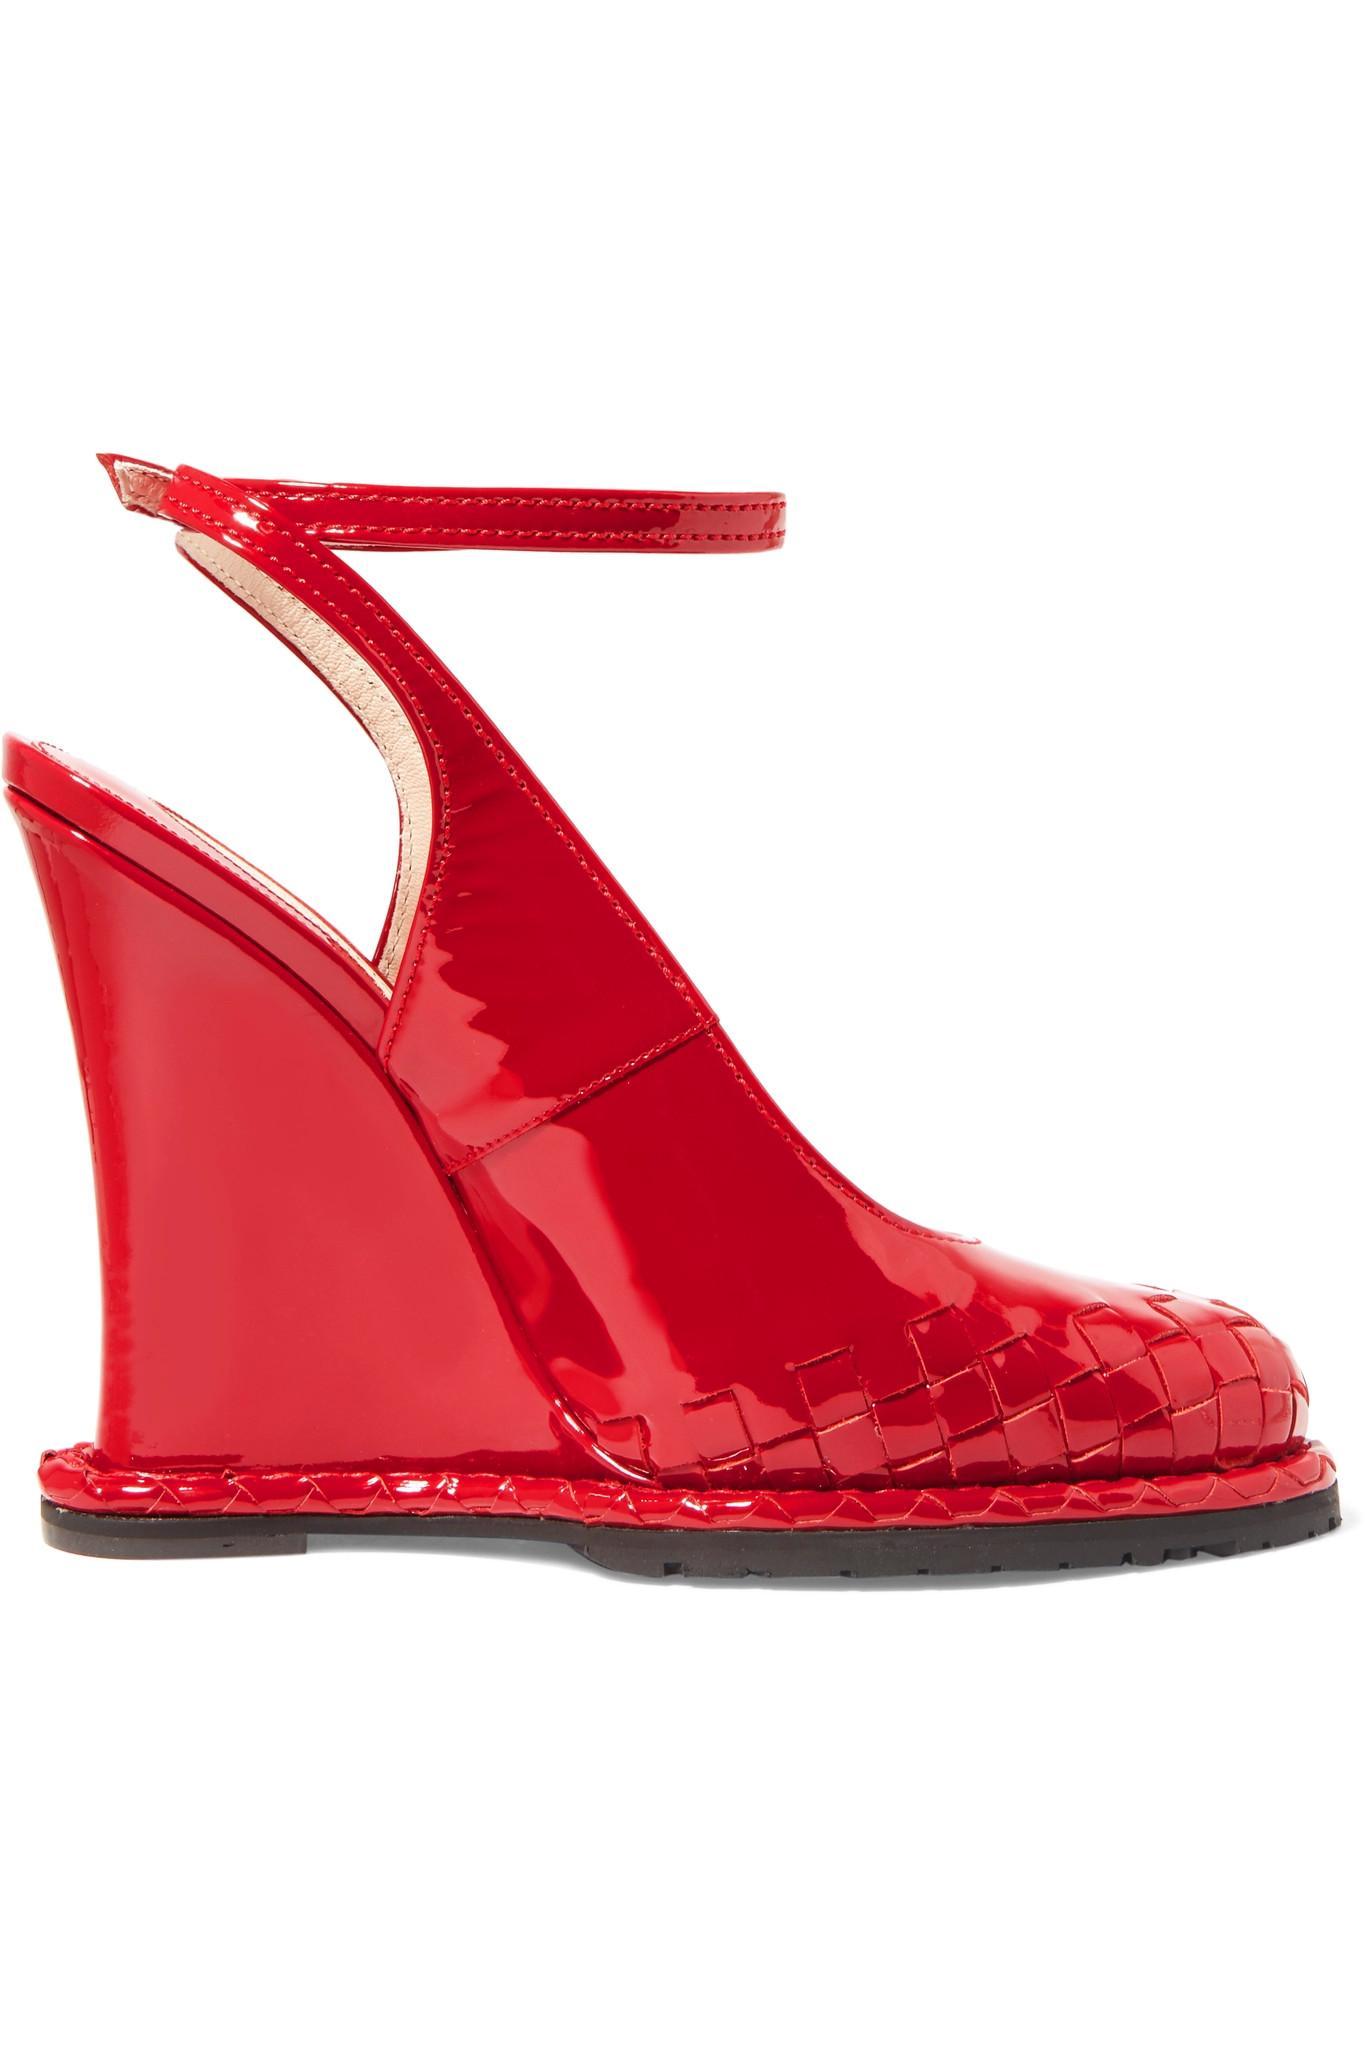 Bottega Veneta Shoes Uk